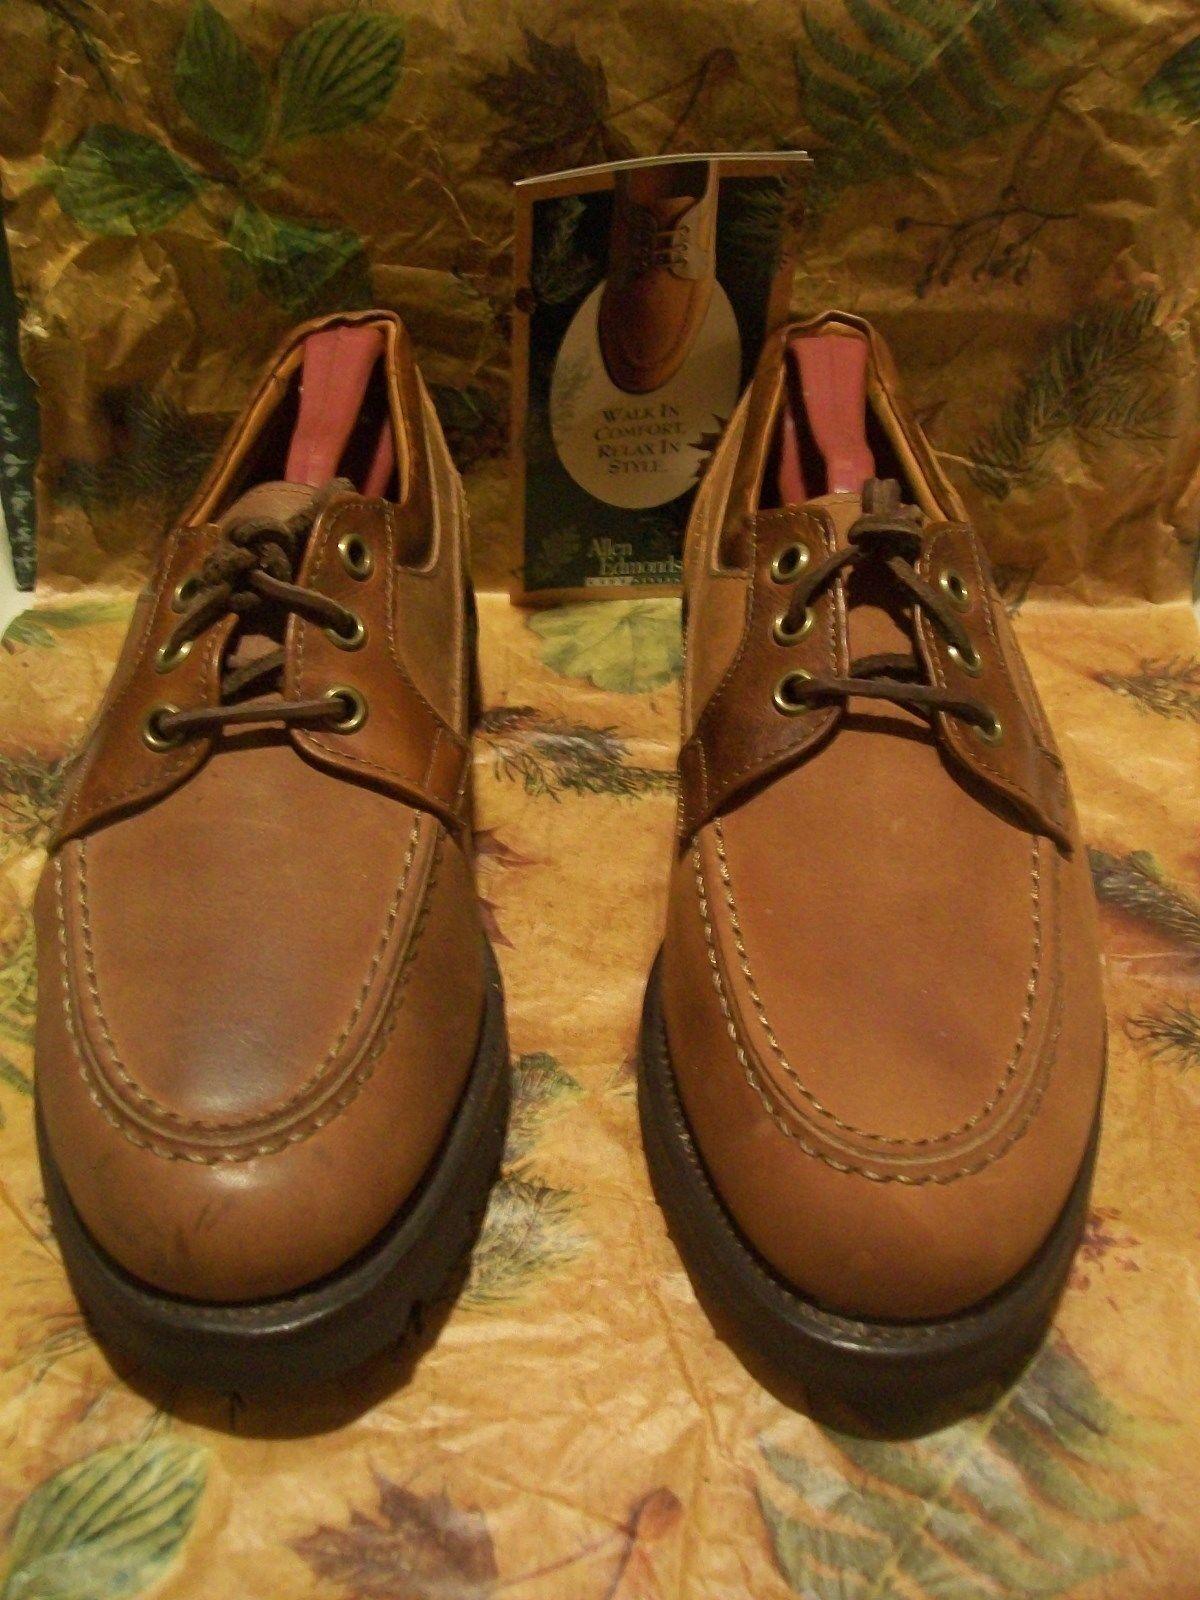 New 1st Quality Allen Edmonds Roanoke 7 D brown